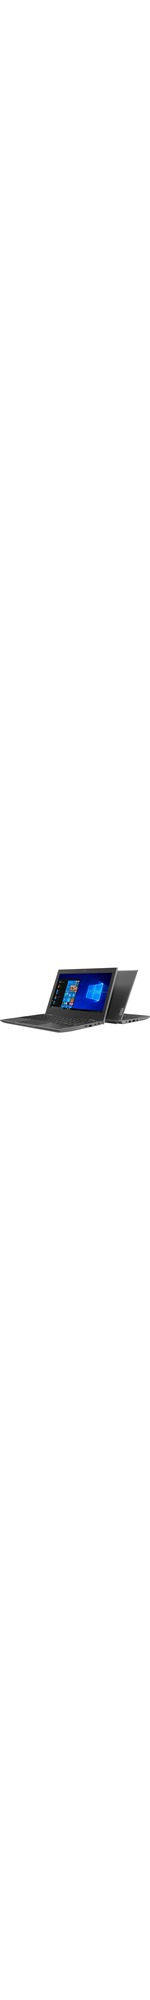 Lenovo 100e Windows 2nd Gen 81M8003DUK 29.5 cm 11.6And#34; Netbook - HD - 1366 x 768 - Intel Celeron N4020 Dual-core 2 Core 1.10 GHz - 4 GB RAM - 64 GB Flash Memory -